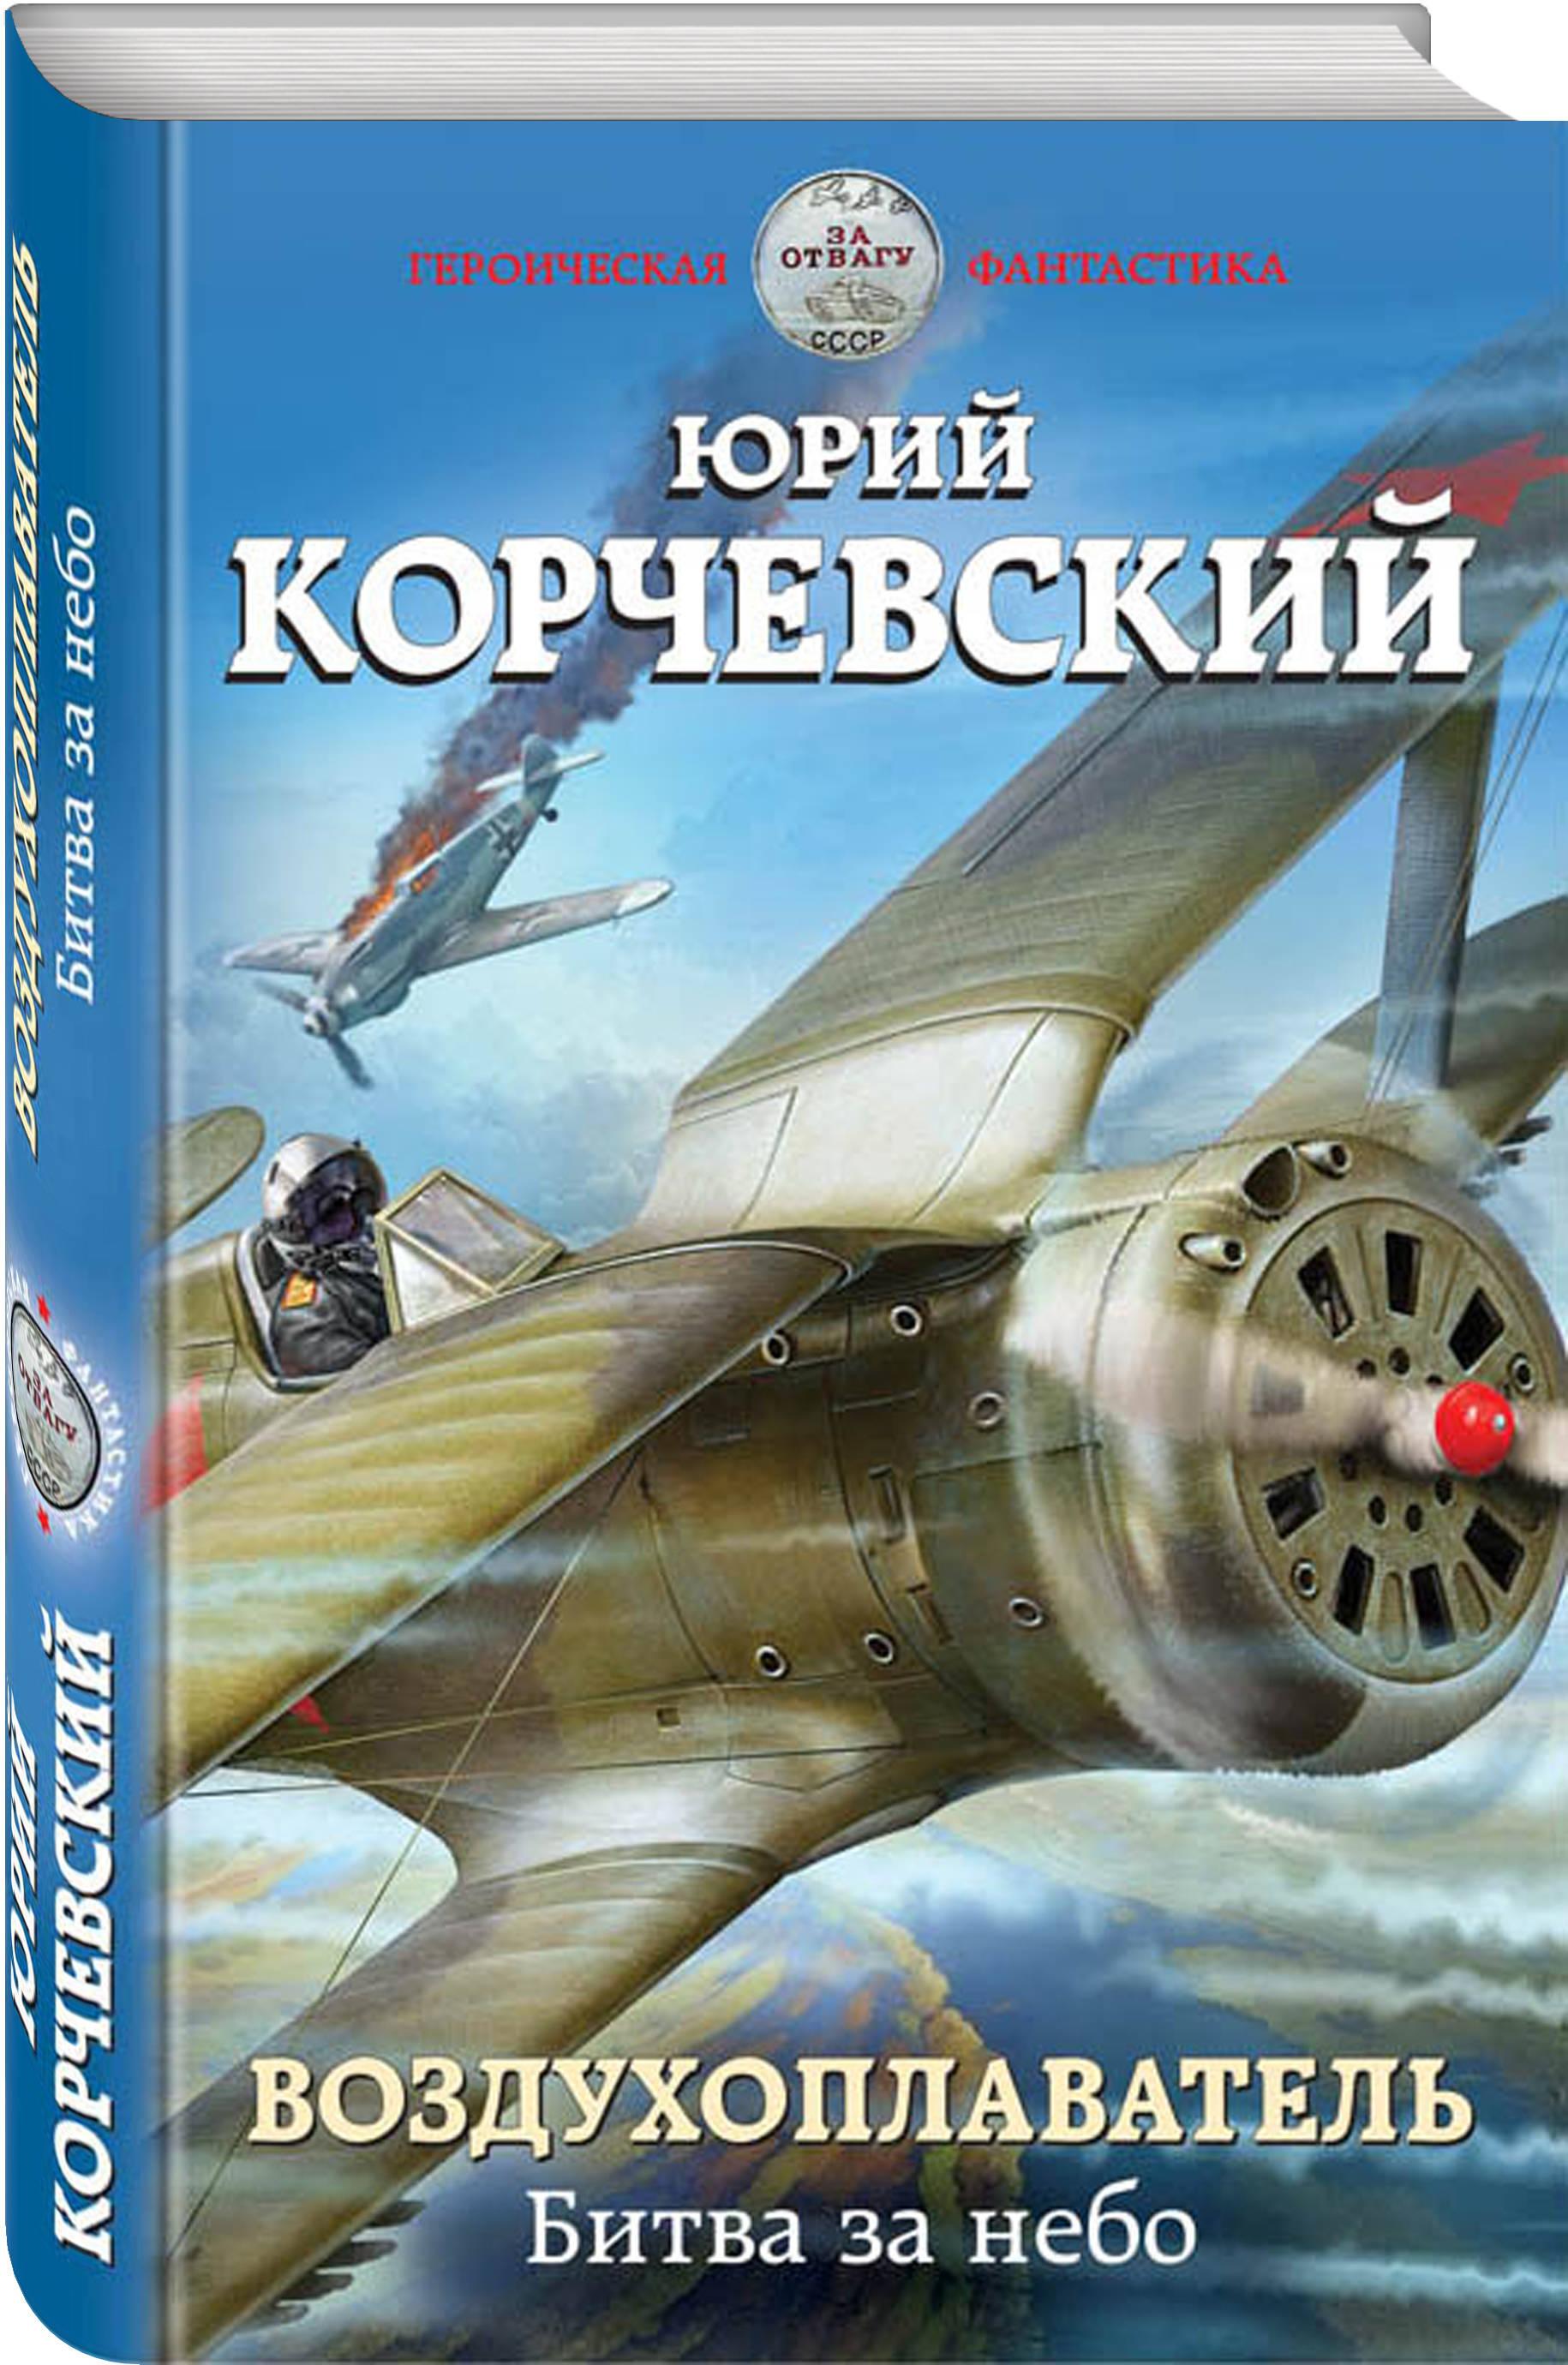 Юрий Корчевский Воздухоплаватель. Битва за небо